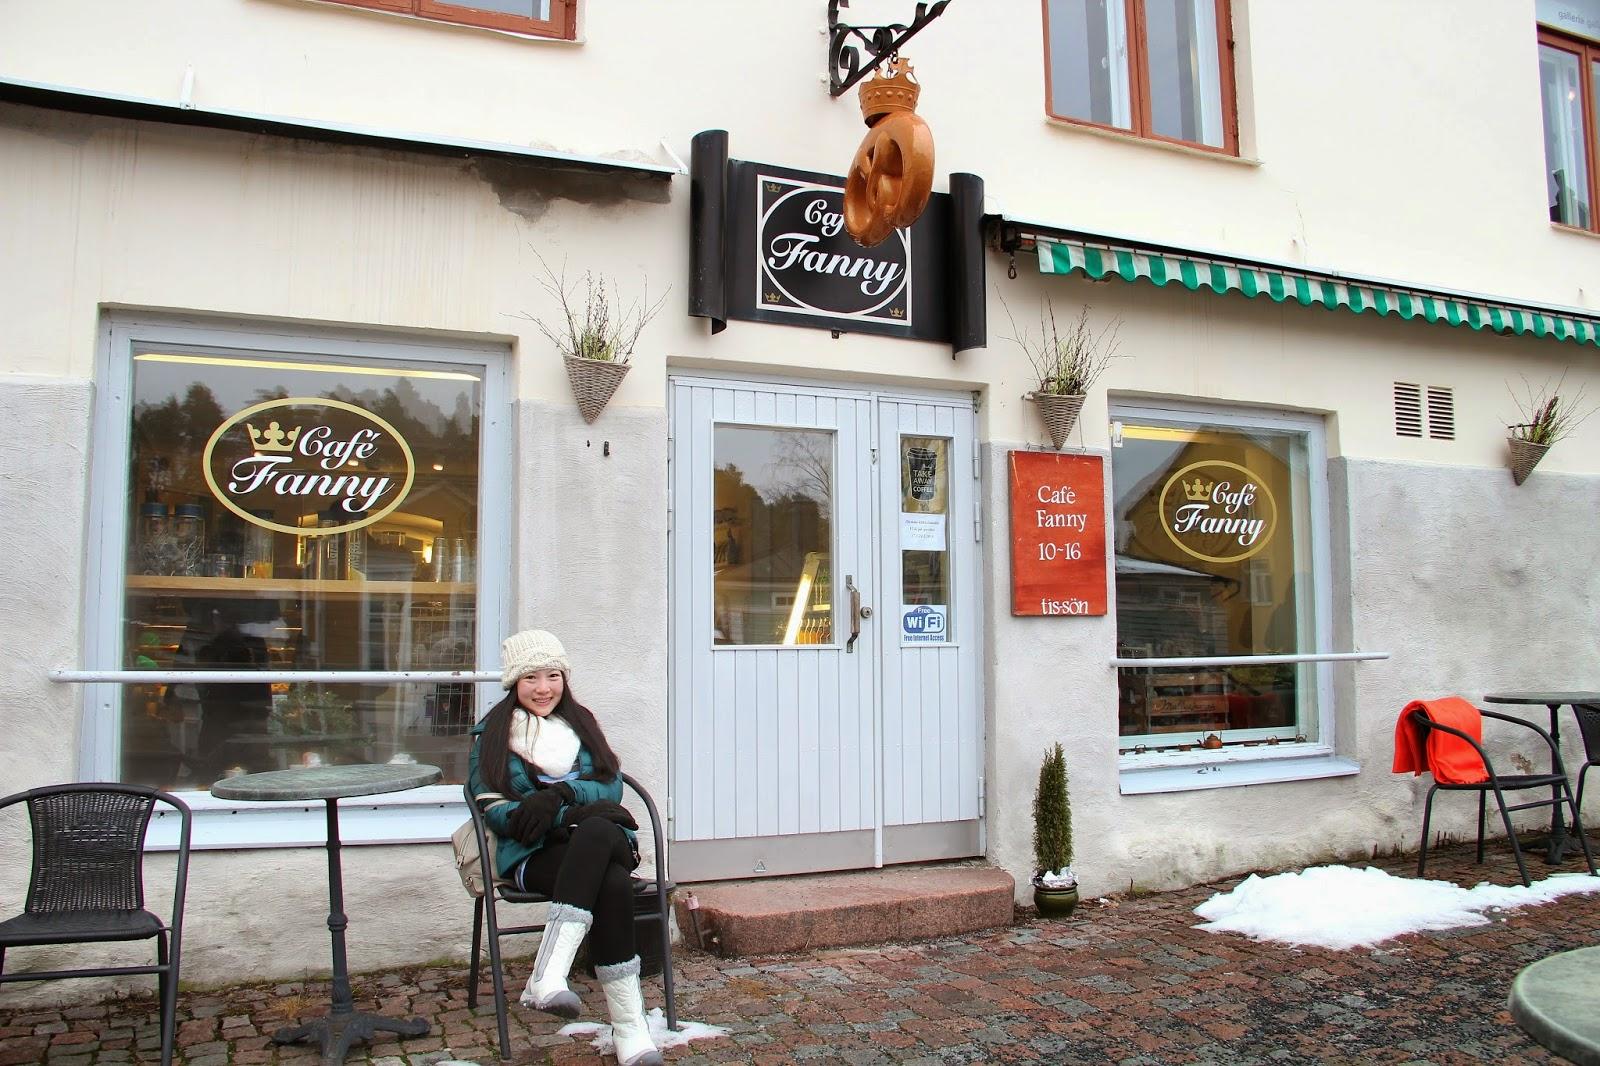 Cafe Fanny in Porvoo, Finland